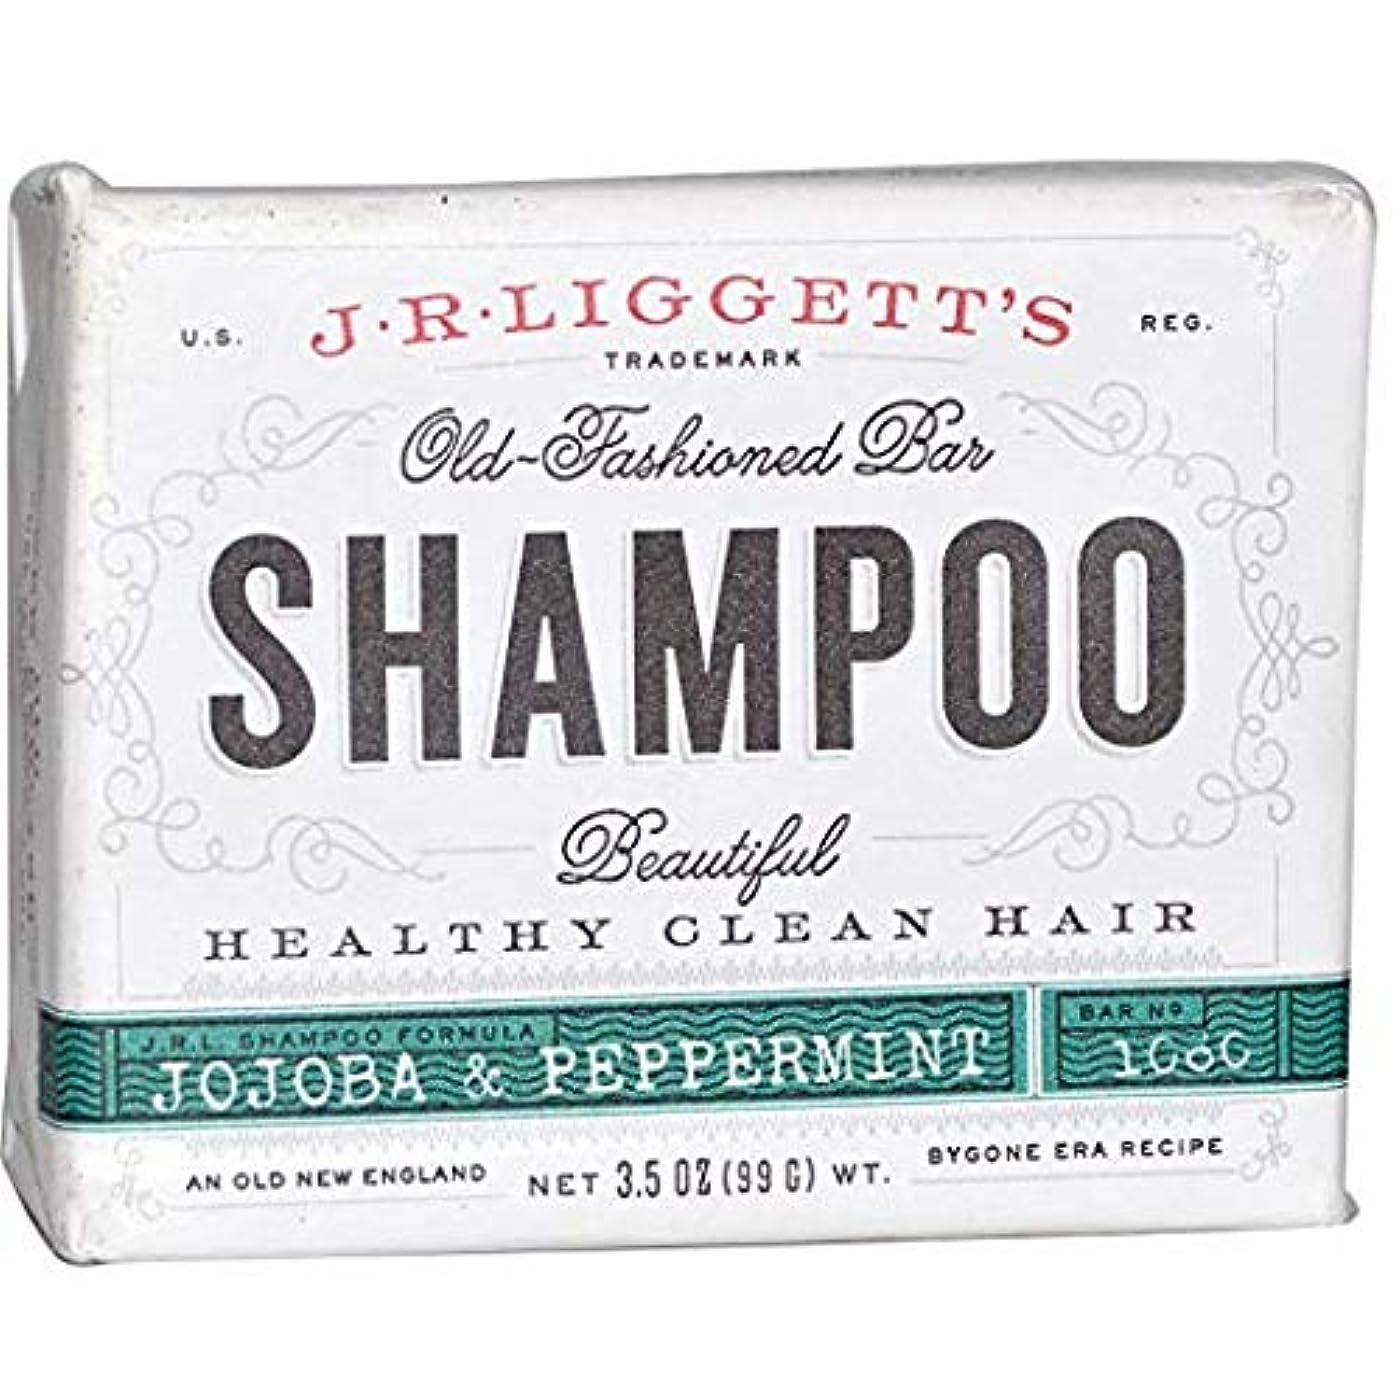 J.R. Liggett's ジェイアール リジェッツ ホホバ&ペパーミントさっぱり清潔 固形石鹸シャンプー 3.5 oz (99 g) [並行輸入品]